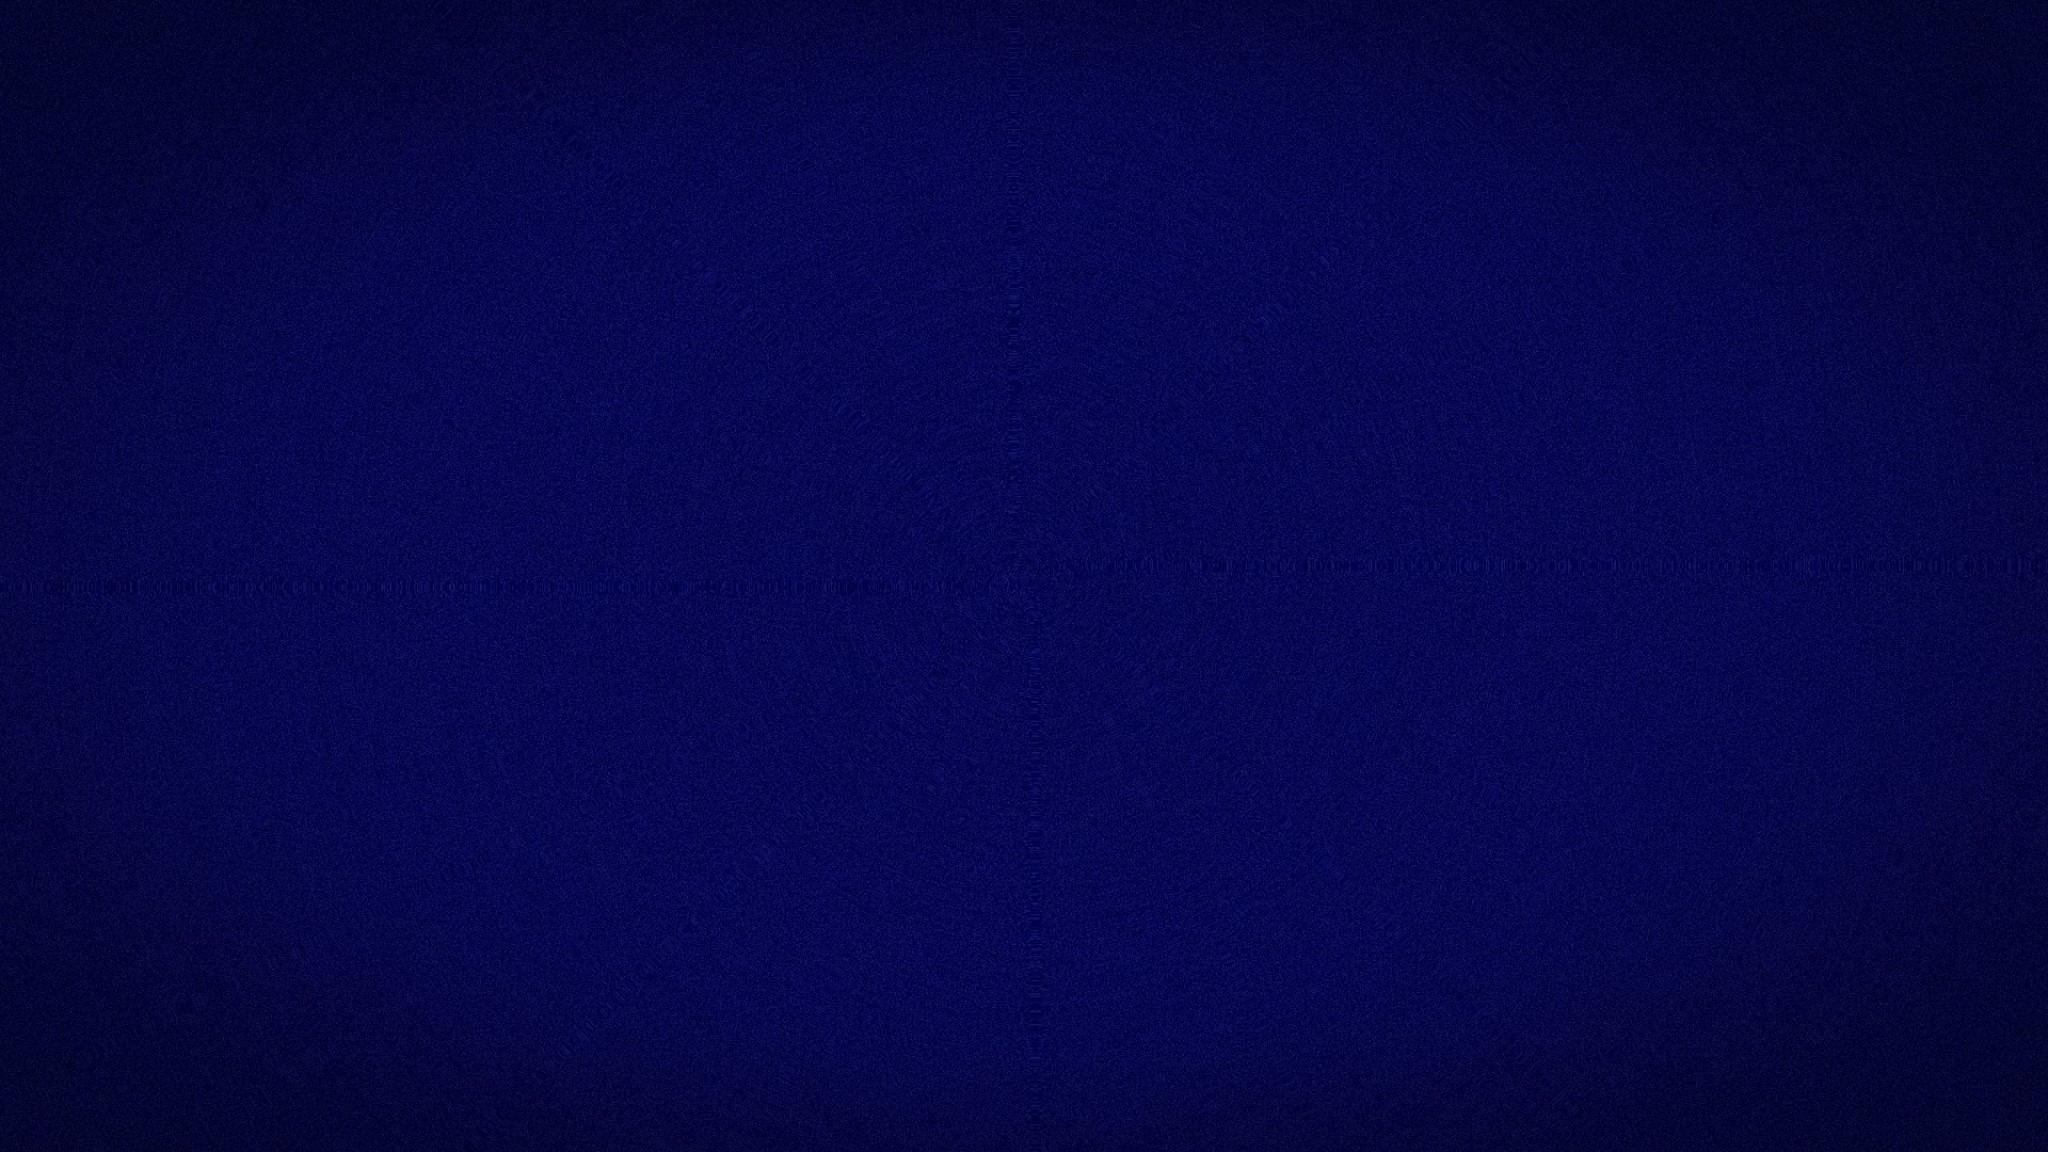 Solid black hd wallpaper wallpapersafari for Fondo azul oscuro